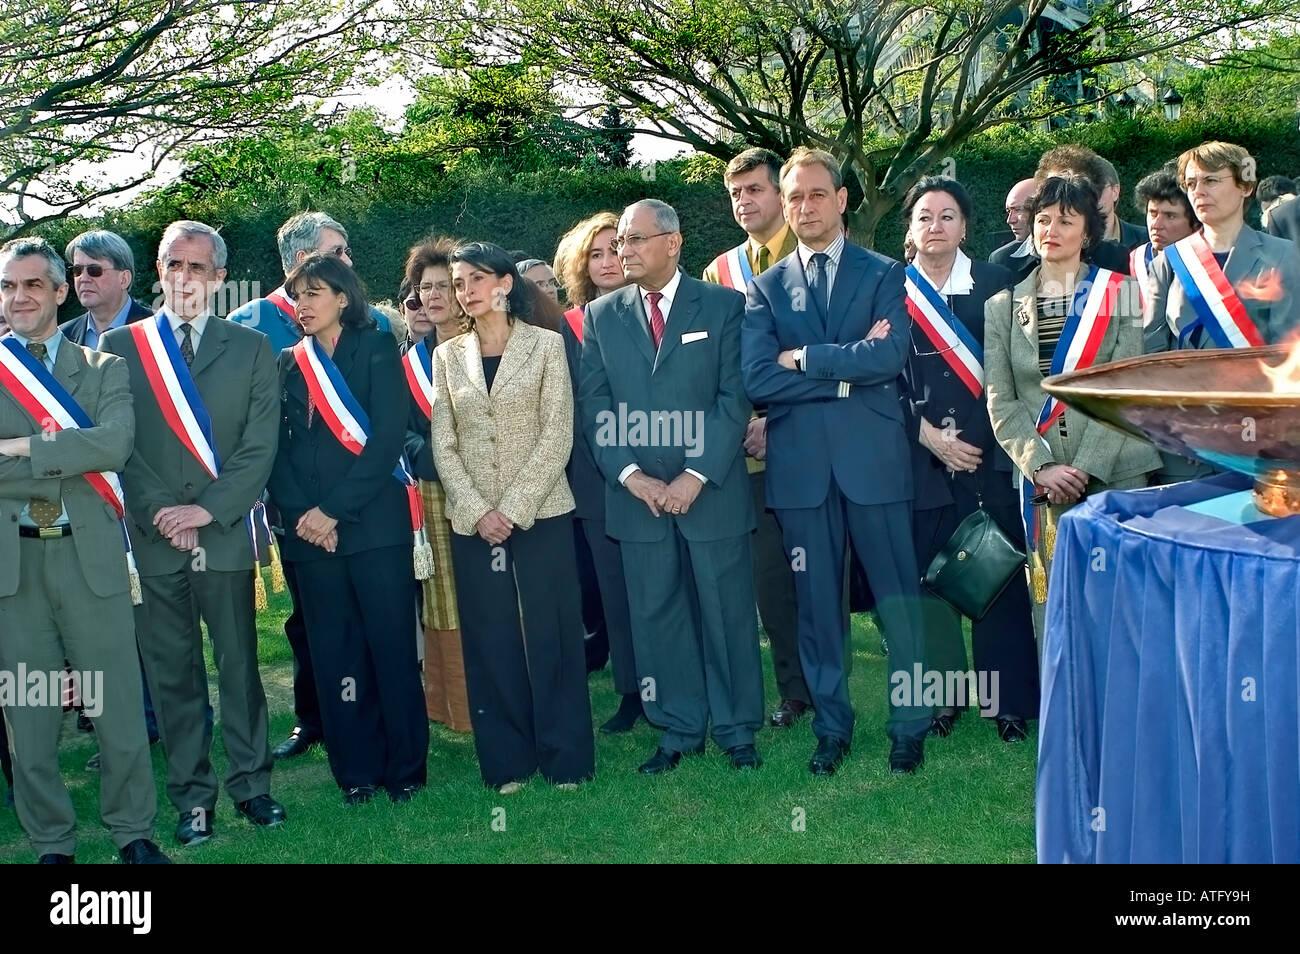 Paris France, Memorial Ceremonies Homage For the Pink Triangles Paris Mayor 'Bertrand Delanoe' (Center with - Stock Image